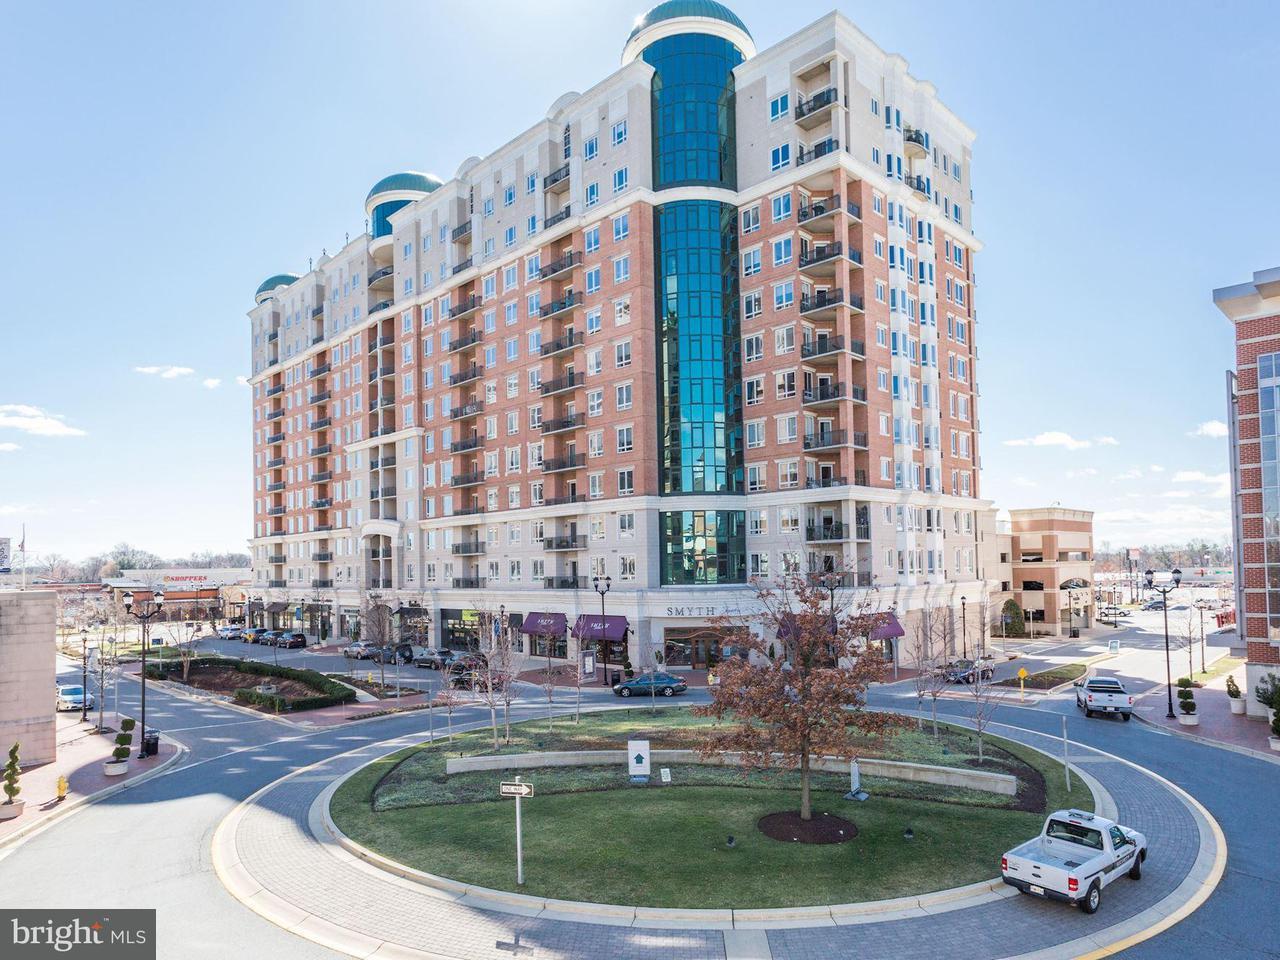 Condominium for Sale at 1915 Towne Centre Blvd #513 1915 Towne Centre Blvd #513 Annapolis, Maryland 21401 United States